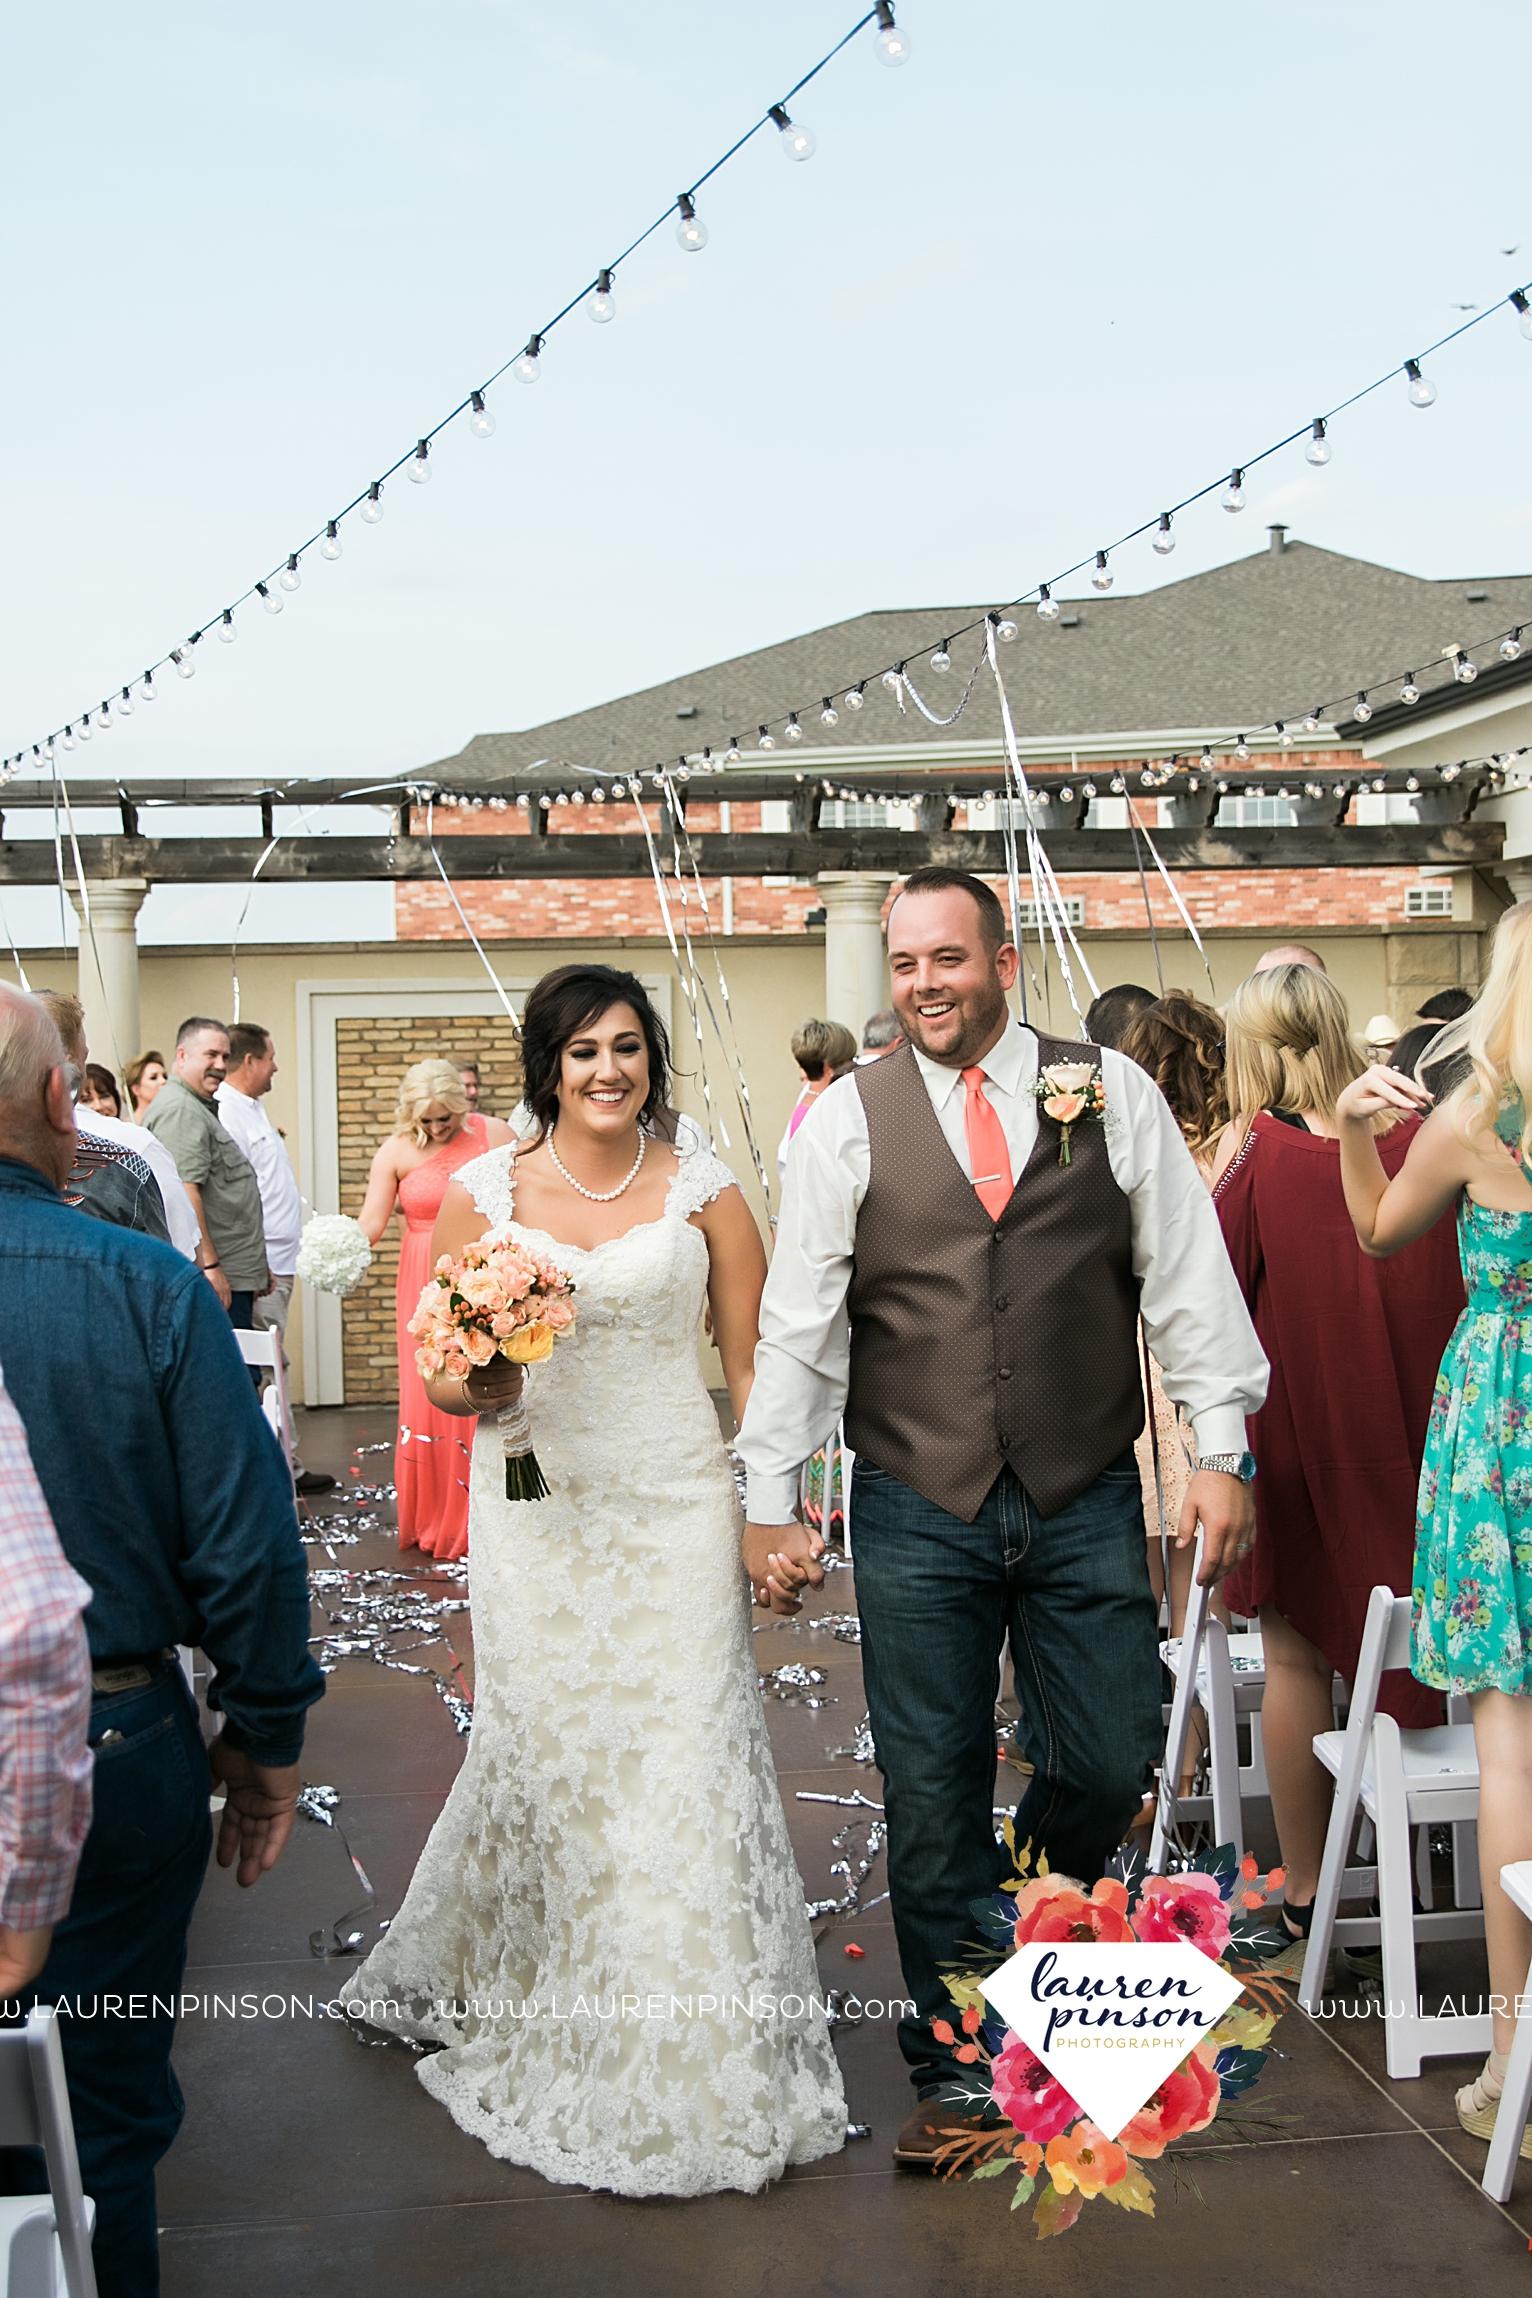 wichita-falls-texas-wedding-photographer-wellington-on-the-lake-with-mayfield-events_2975.jpg